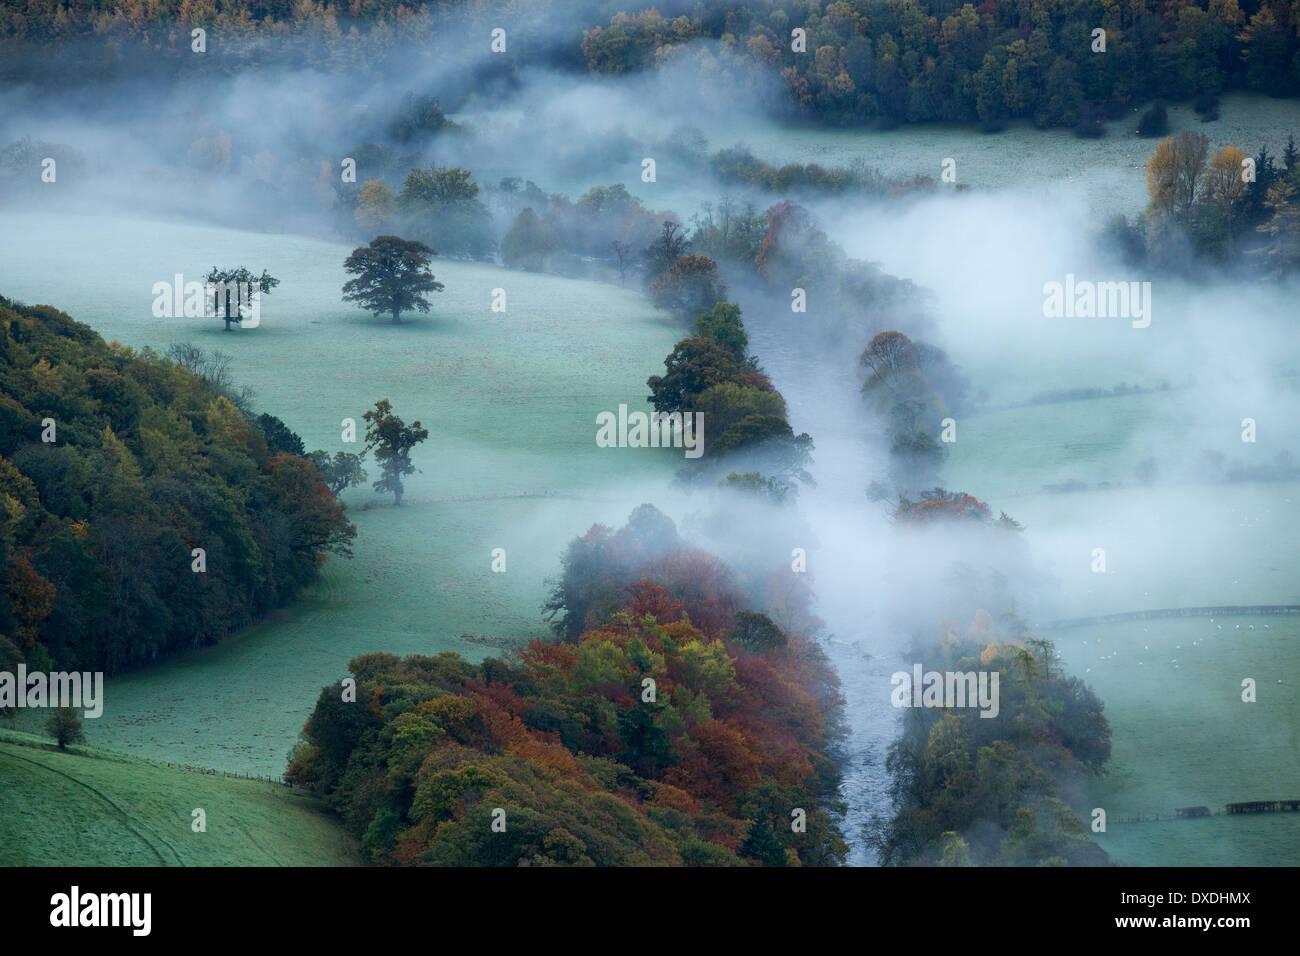 Herbstfärbung und Nebel im Tal Dee (Dyffryn Dyfrdwy) in der Nähe von Llangollen, Denbighshire, Wales Stockbild